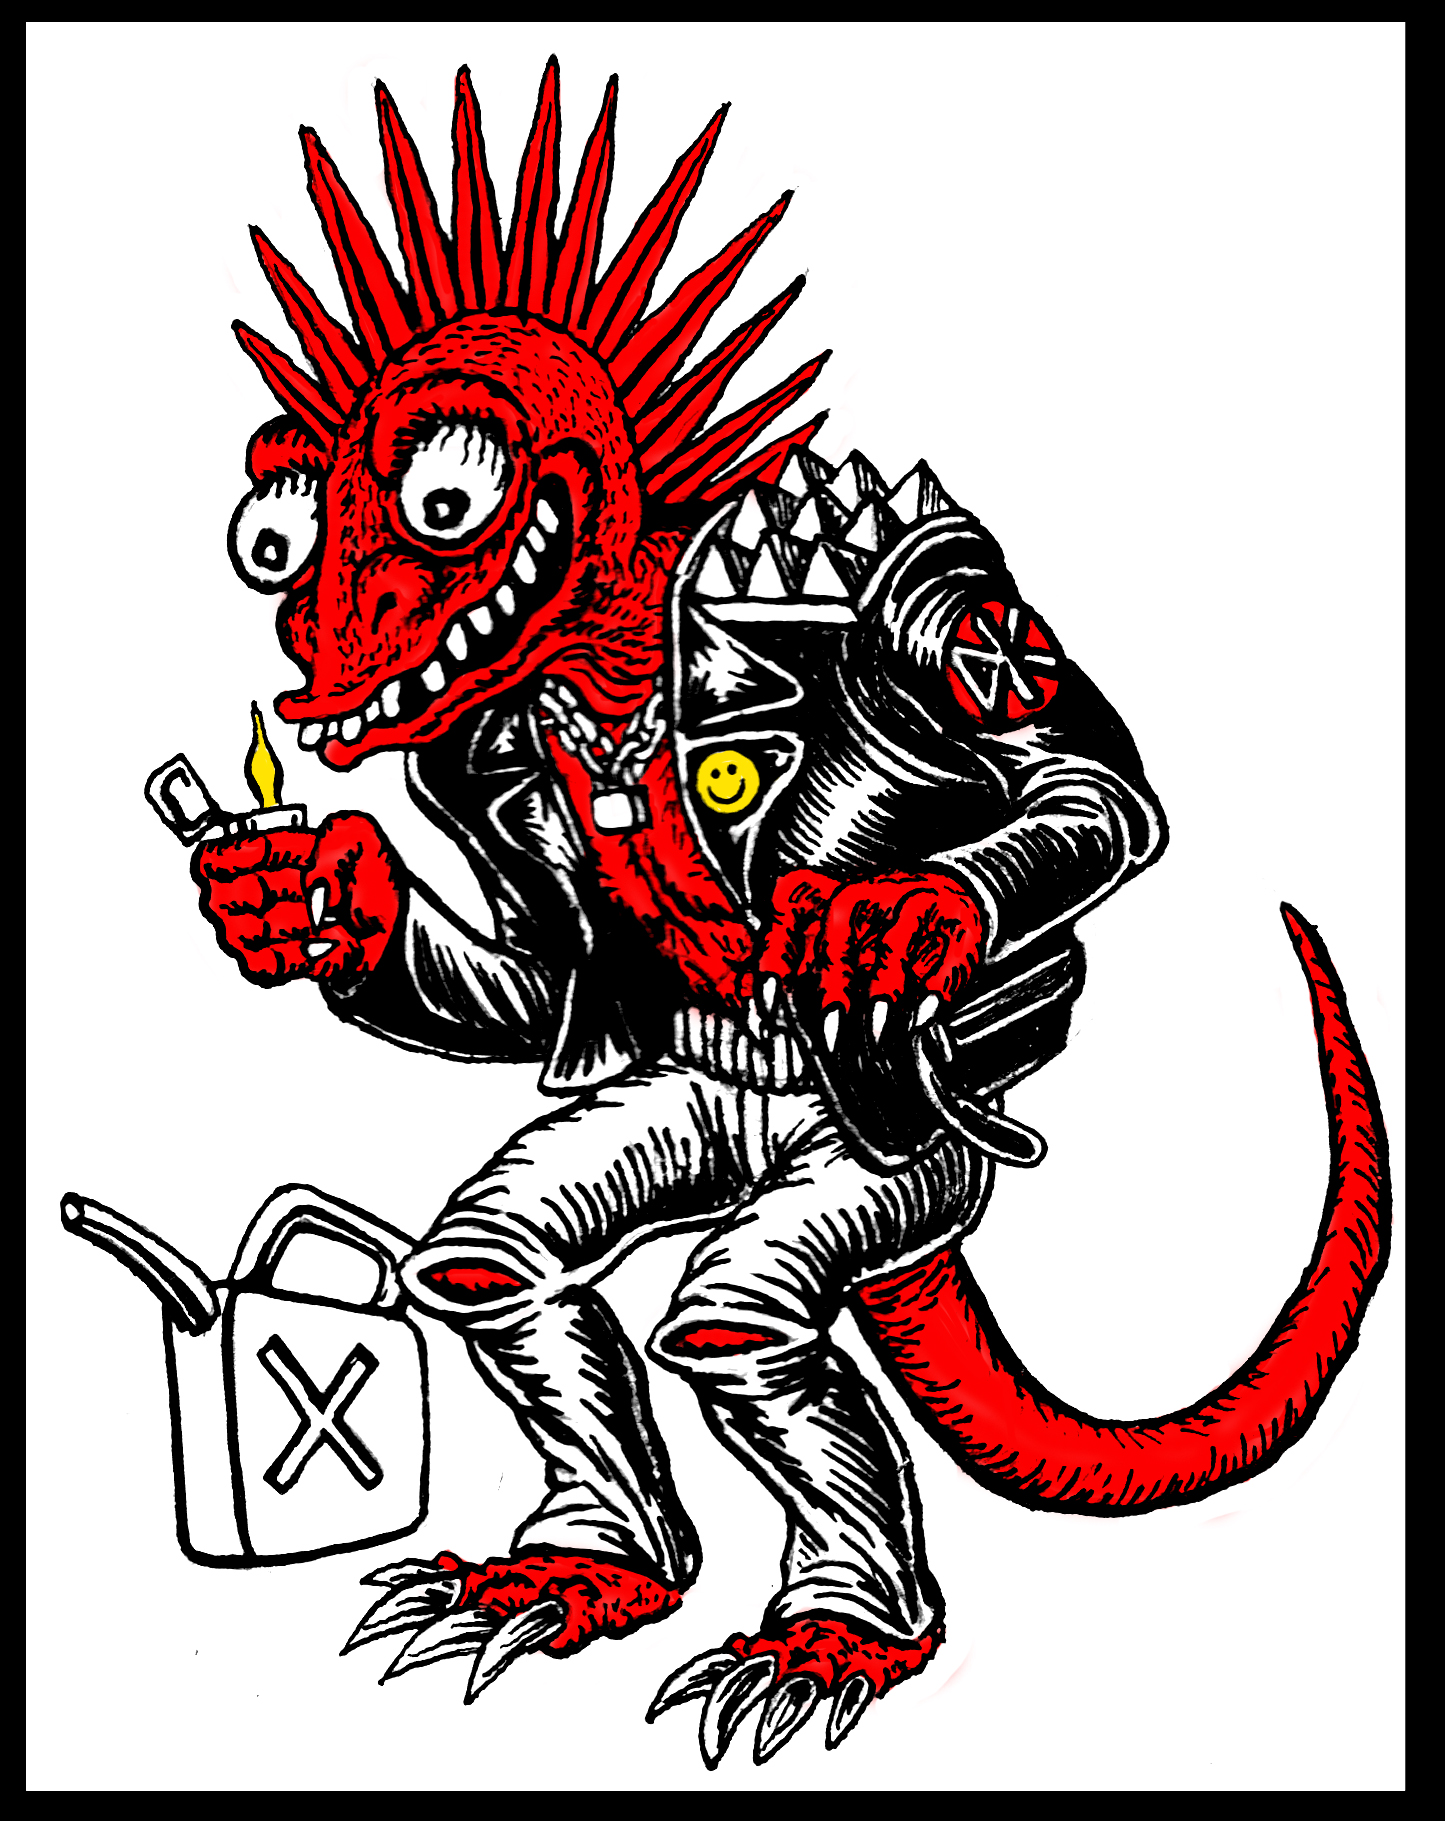 Lizard Punk Sticker Design  2013 ink and digital